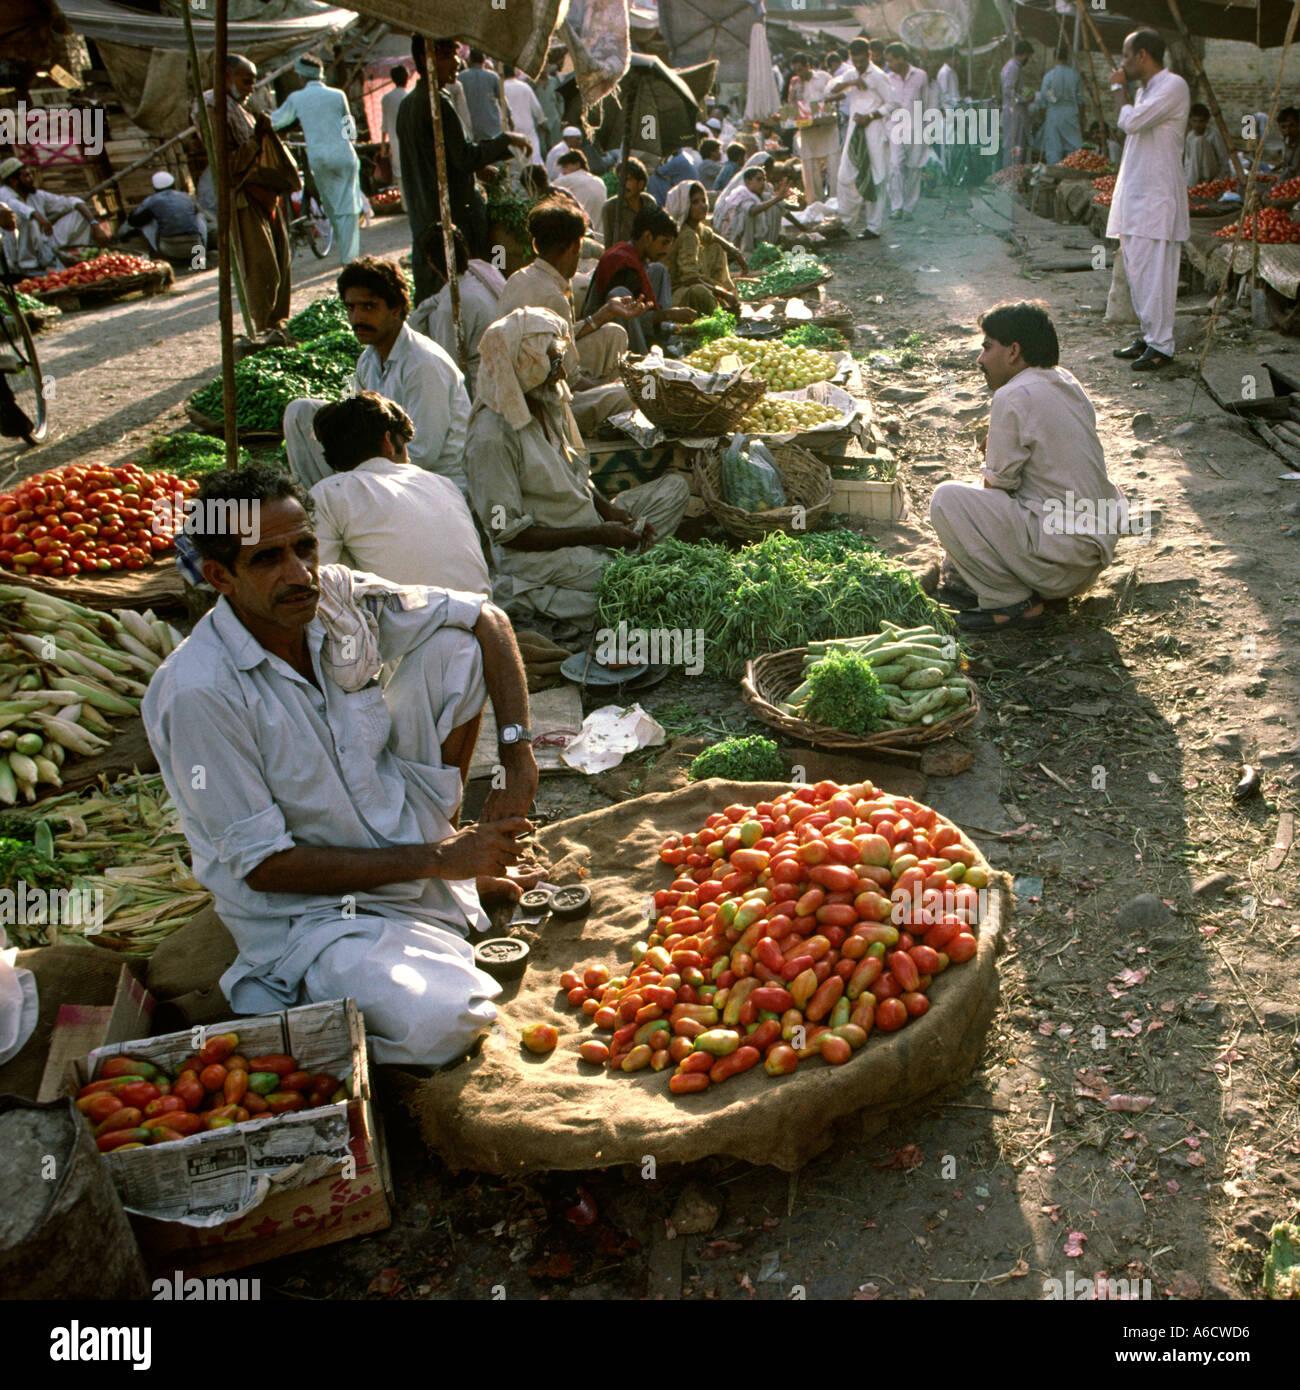 Rawalpindi Streets: Pakistan Rawalpindi Rajah Bazaar Tomato Stall In Vegetable